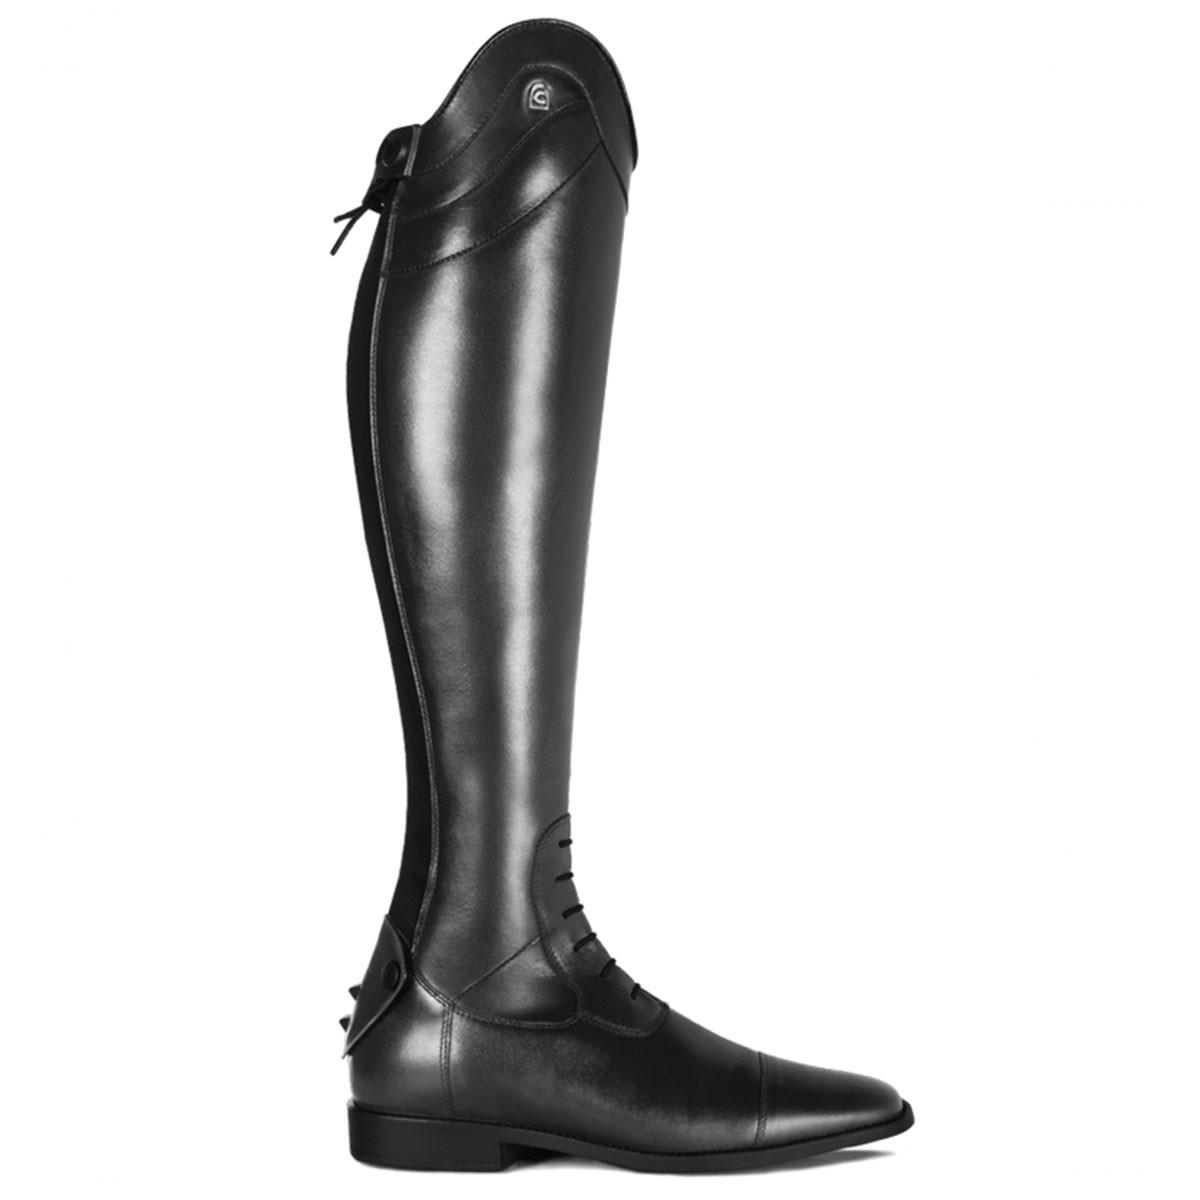 Cavallo Linus Slim rijlaars zwart maat:10-10.5 / h52-w38